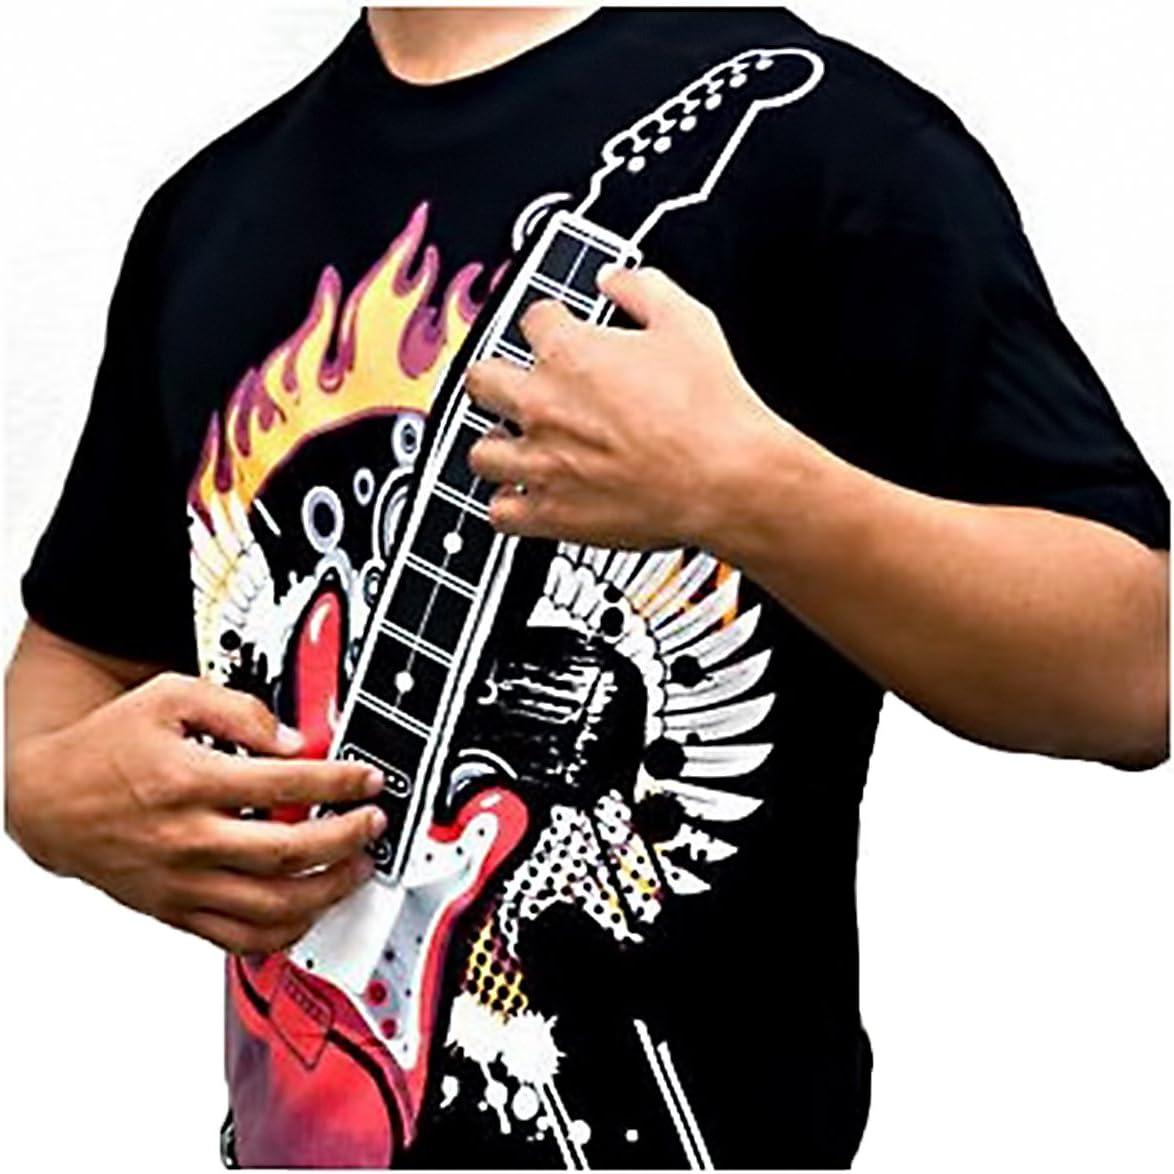 BlueBD GmbH BD @/ Misura: XXL Motivo: Chitarra elettrica /T-Shirt da Uomo